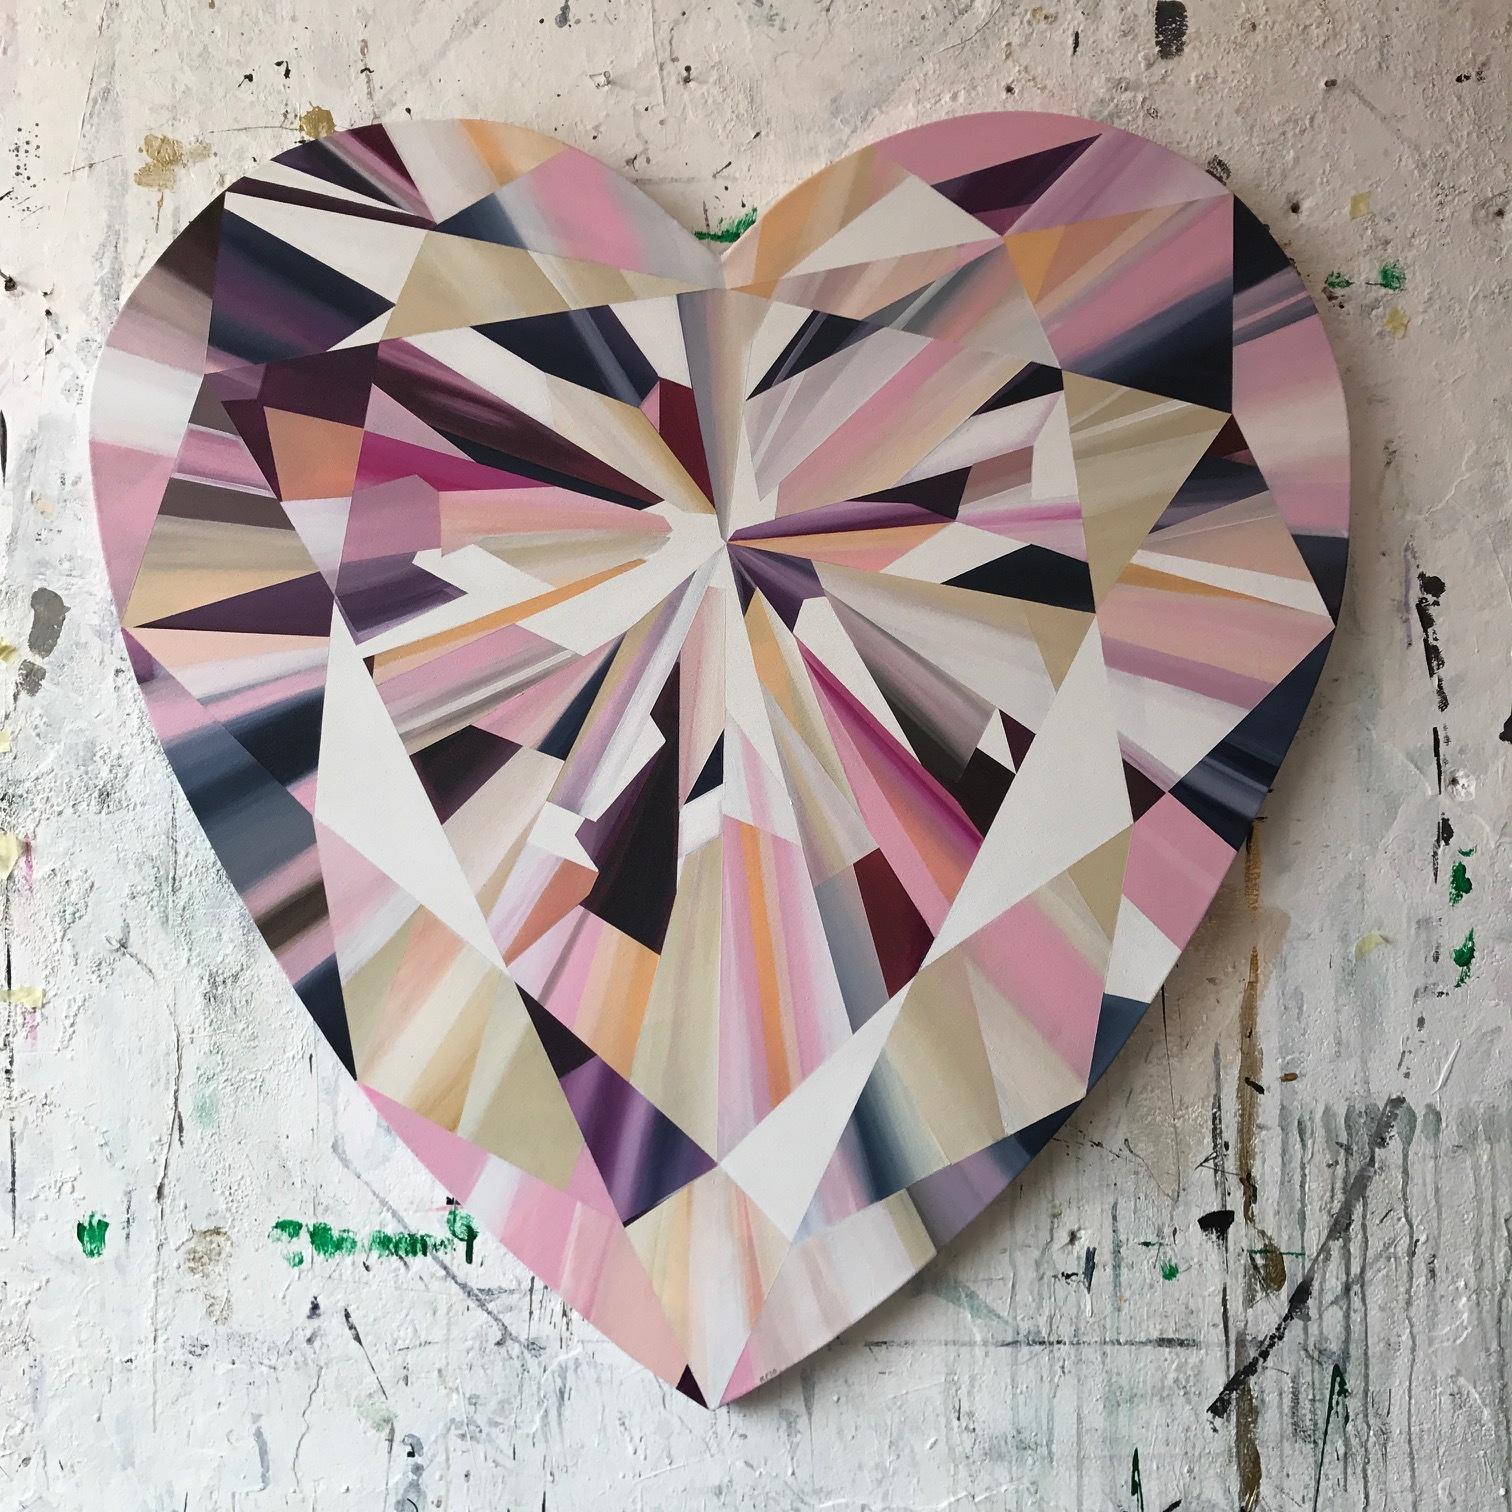 Pink Heart_Pio.JPG